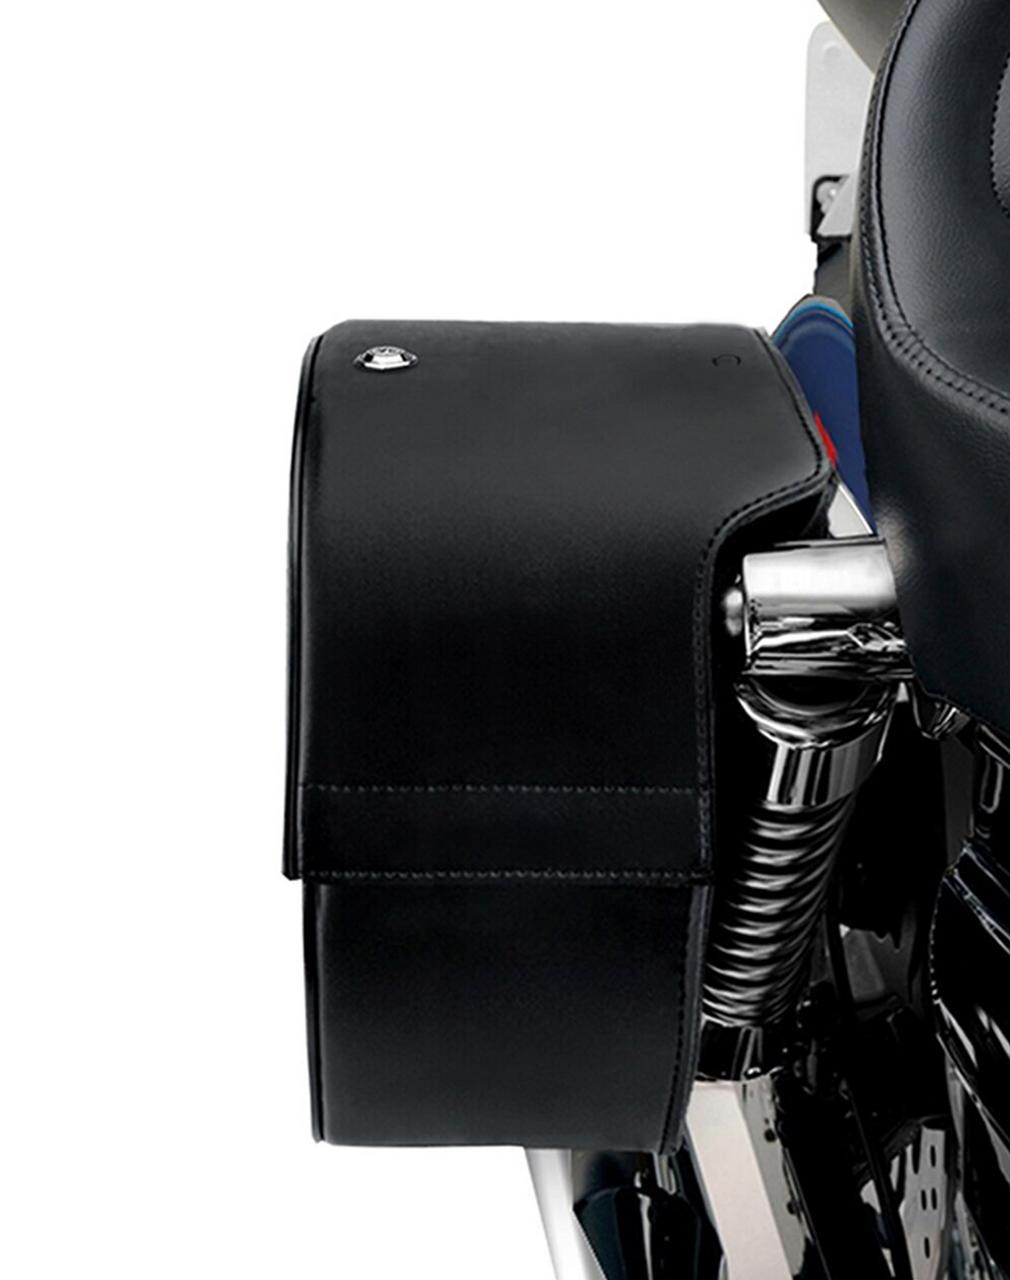 Honda 1500 Valkyrie Standard Vikingbags Shock Cutout Single Strap Large Slanted Leather Motorcycle Saddlebags Shock Cutout View